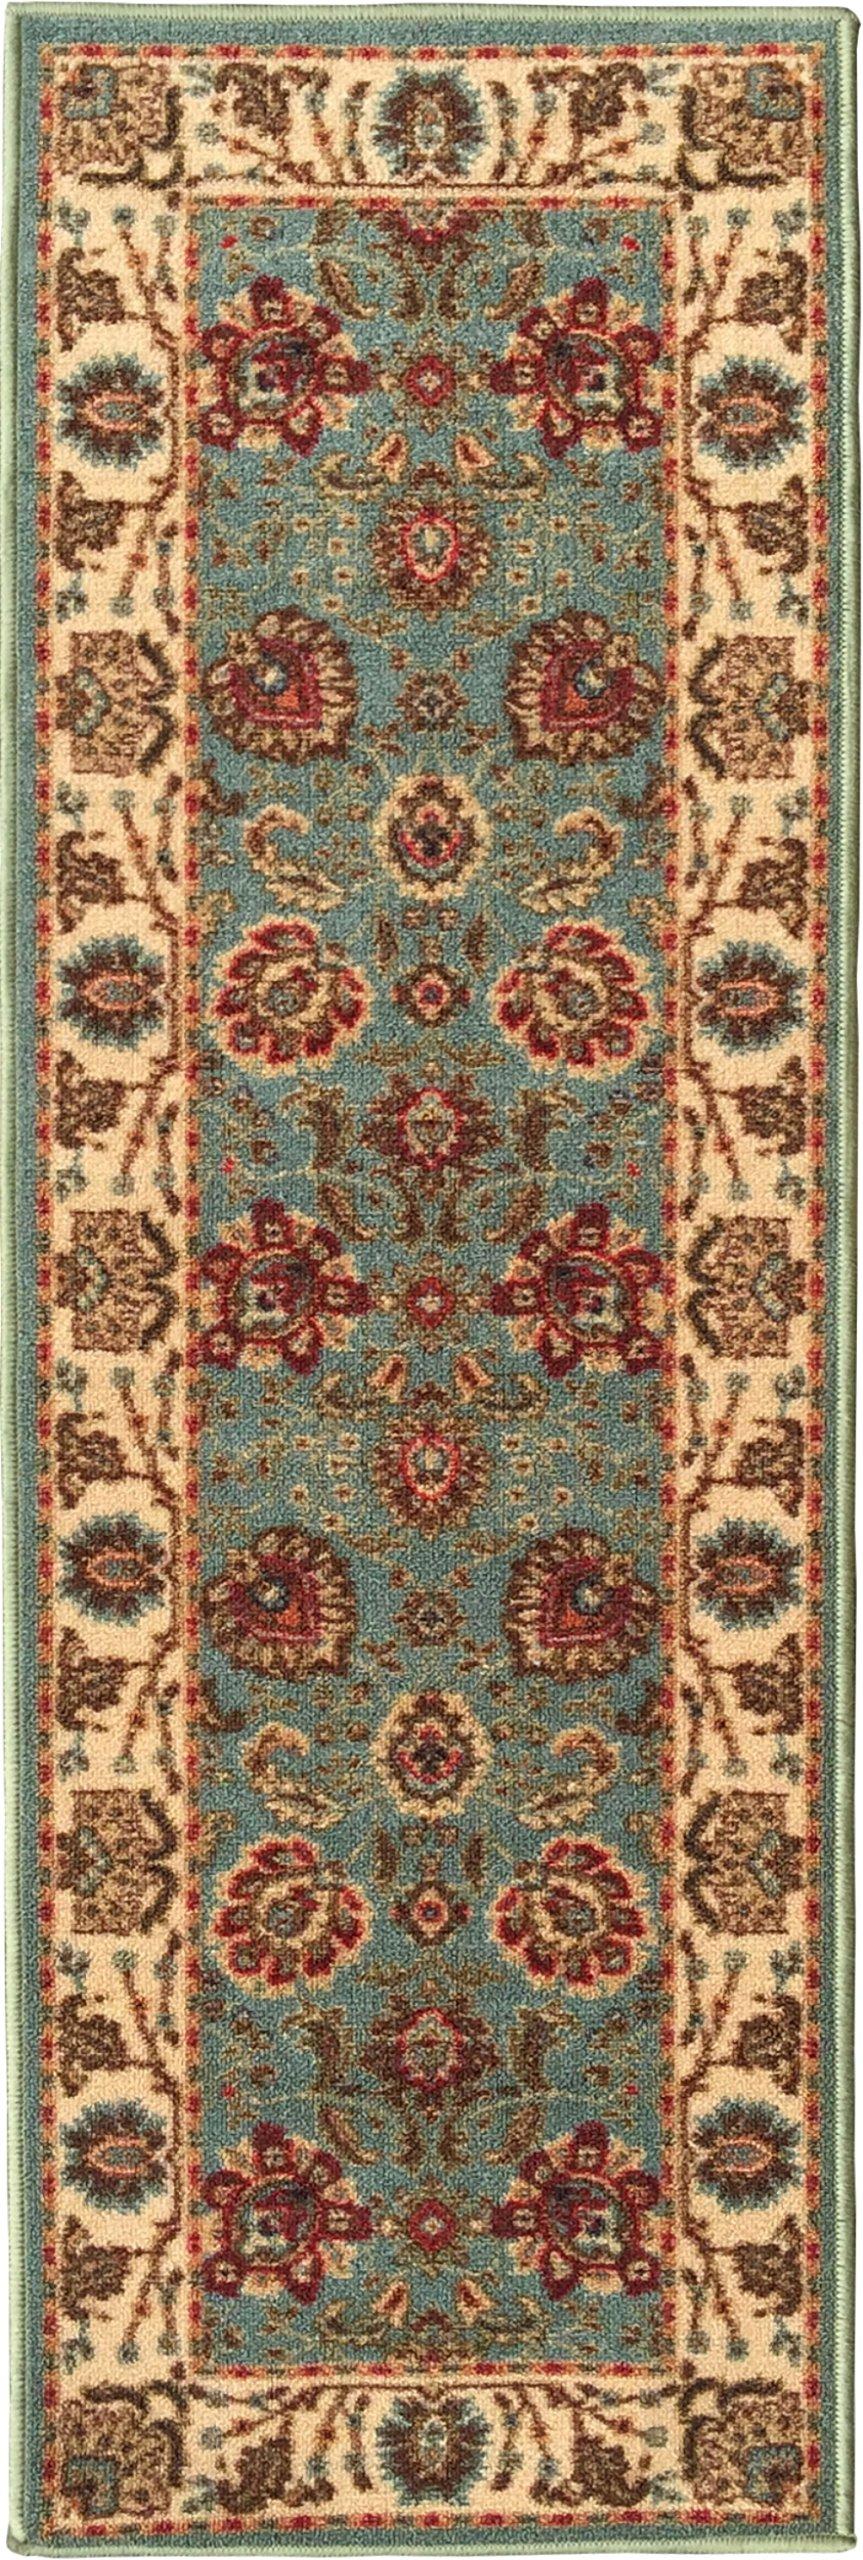 Ottomanson Ottohome Collection Persian Style Oriental Design Non-Skid Rubber Backing Area Rug Hallway Runner, 2'7'' X 9'10'', Seafoam